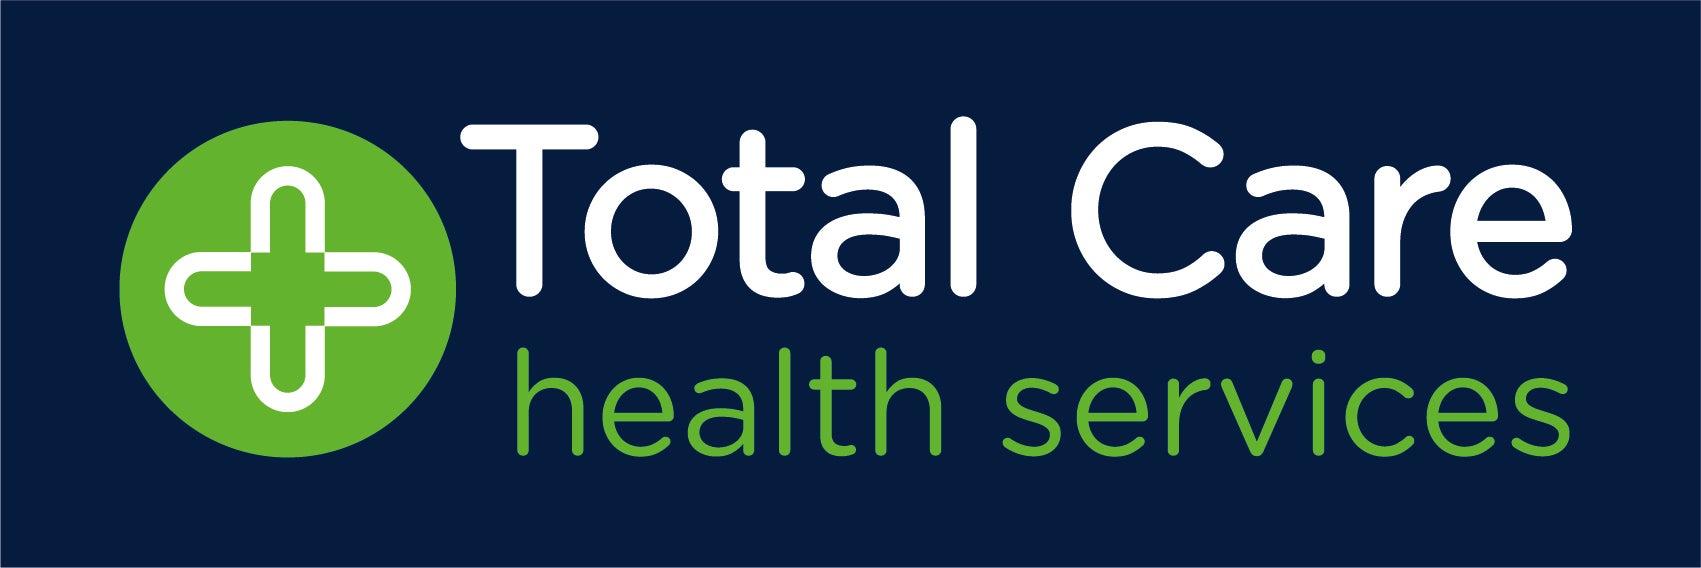 Total Care logo